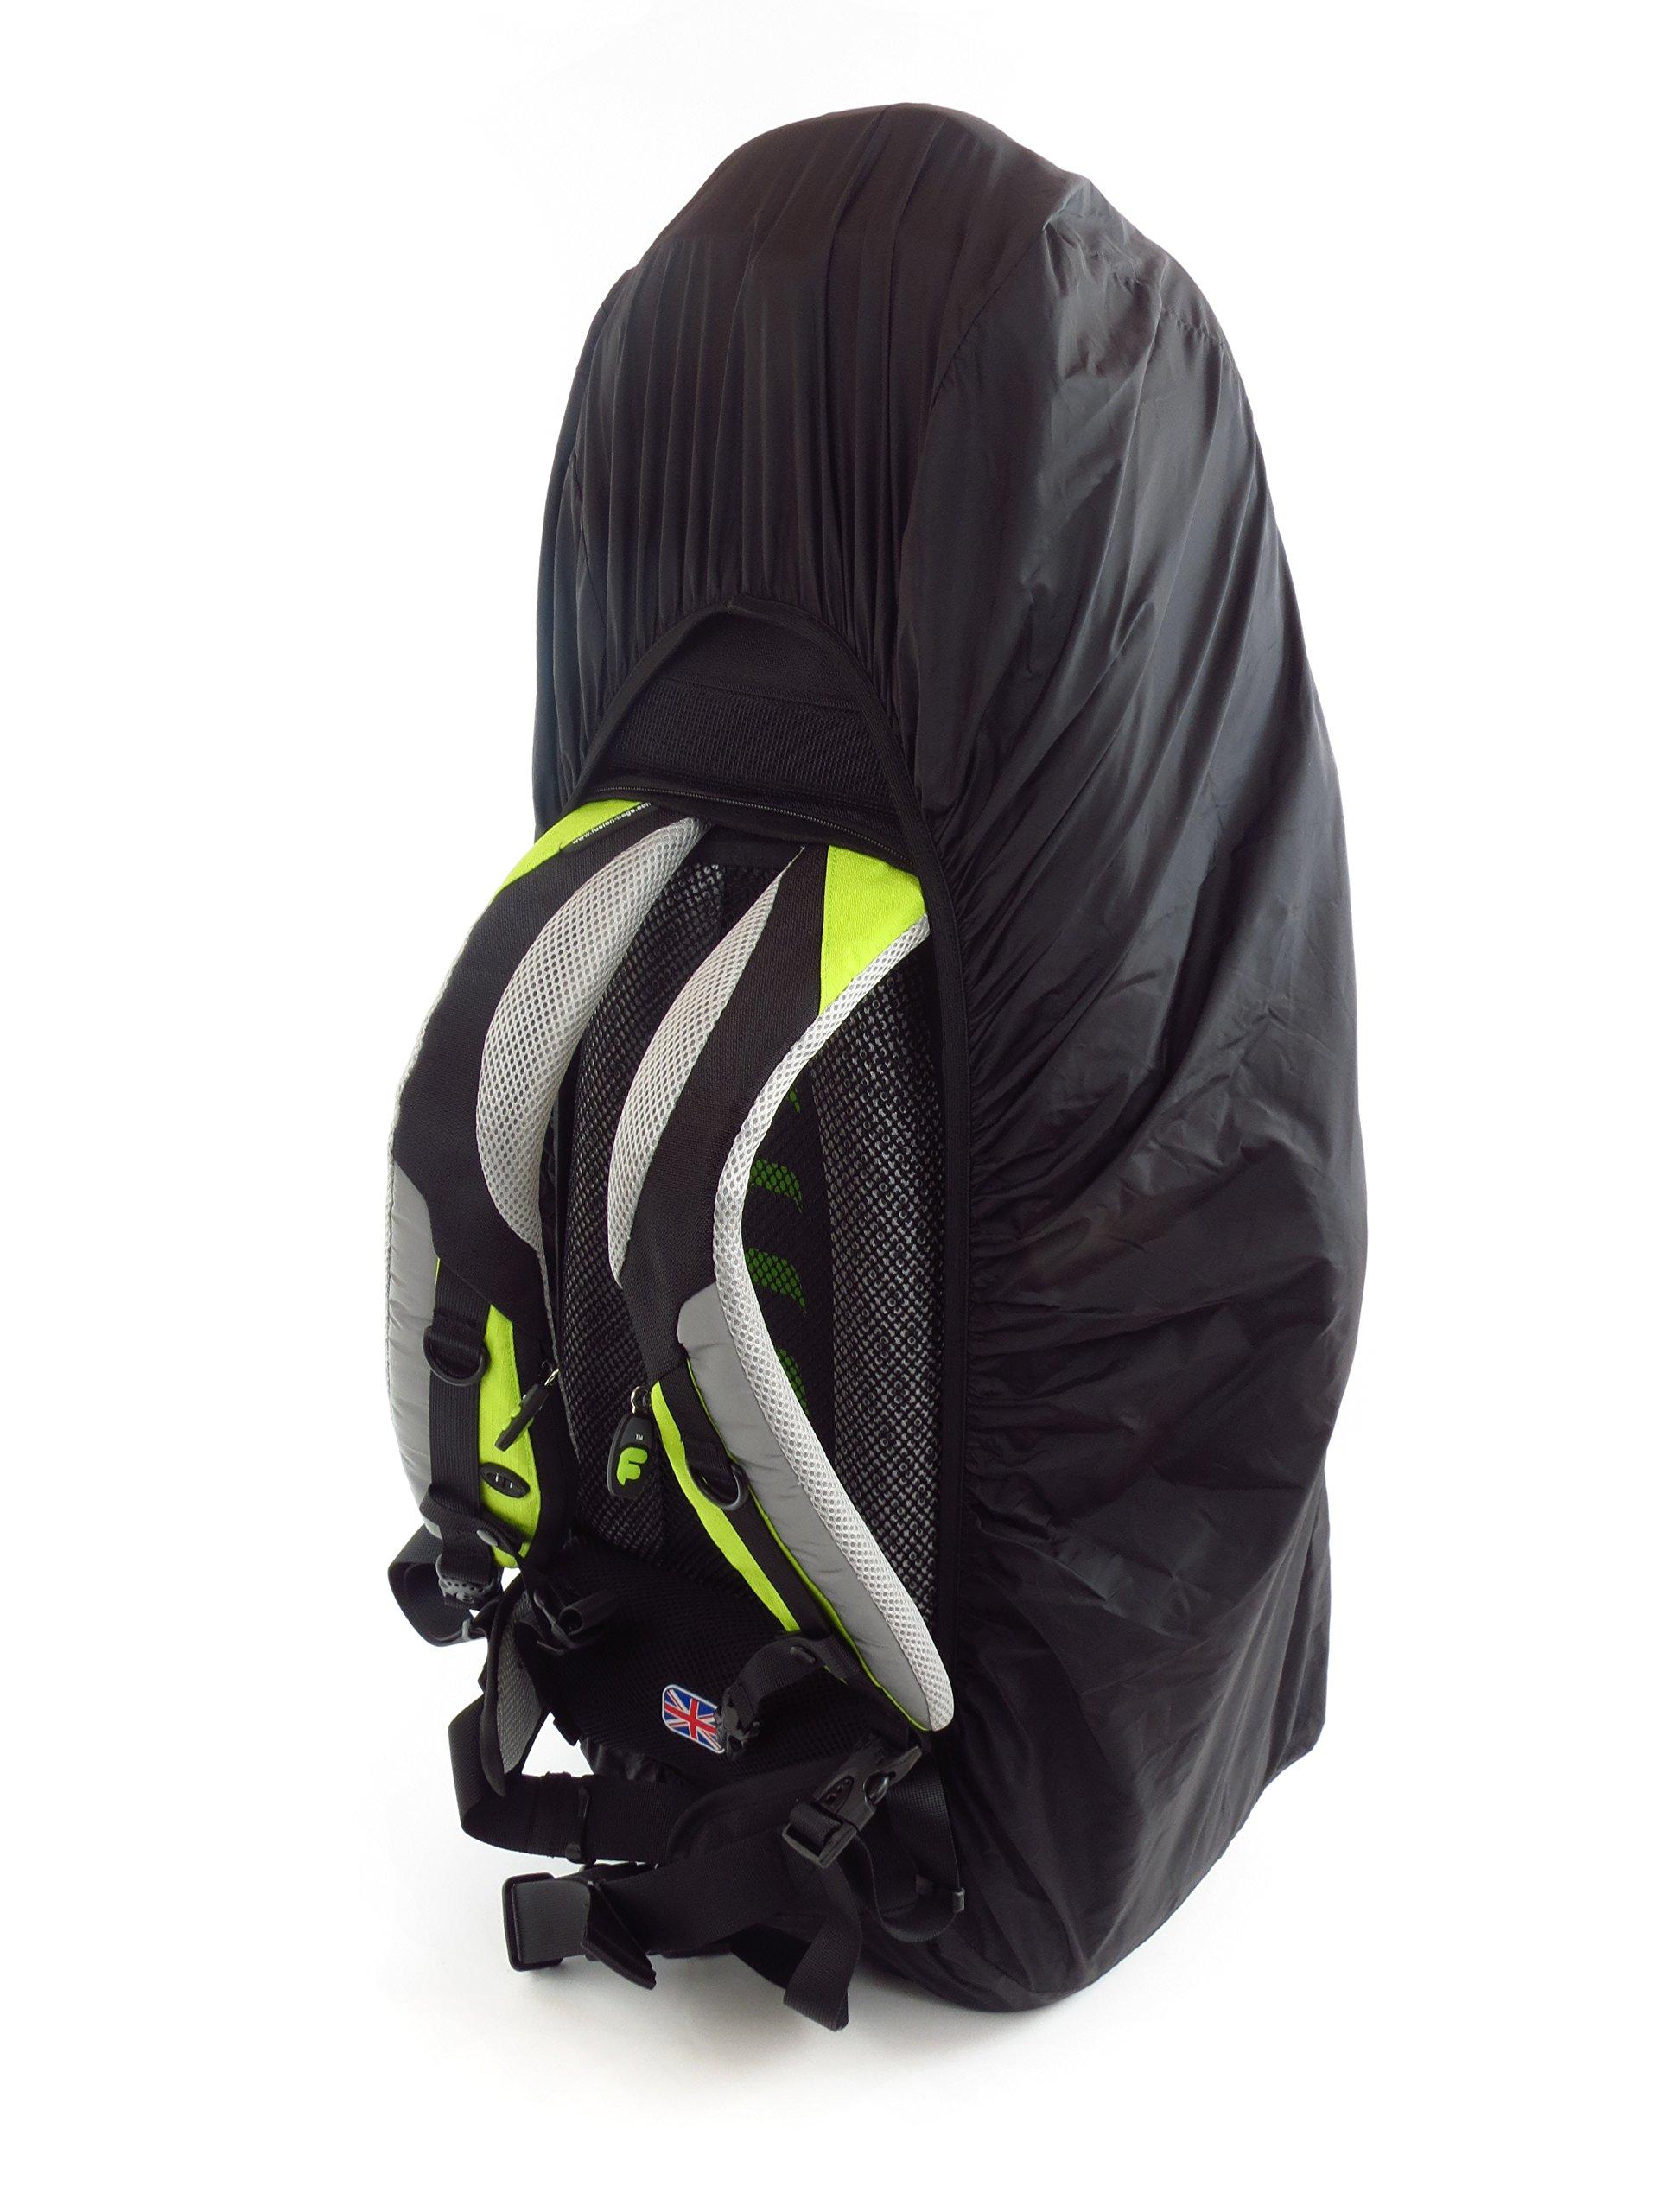 Fusion Premium Series (FB-PW-02-L) - Tenor Saxophone Gig Bag, Black/Lime by Fusion (Image #7)